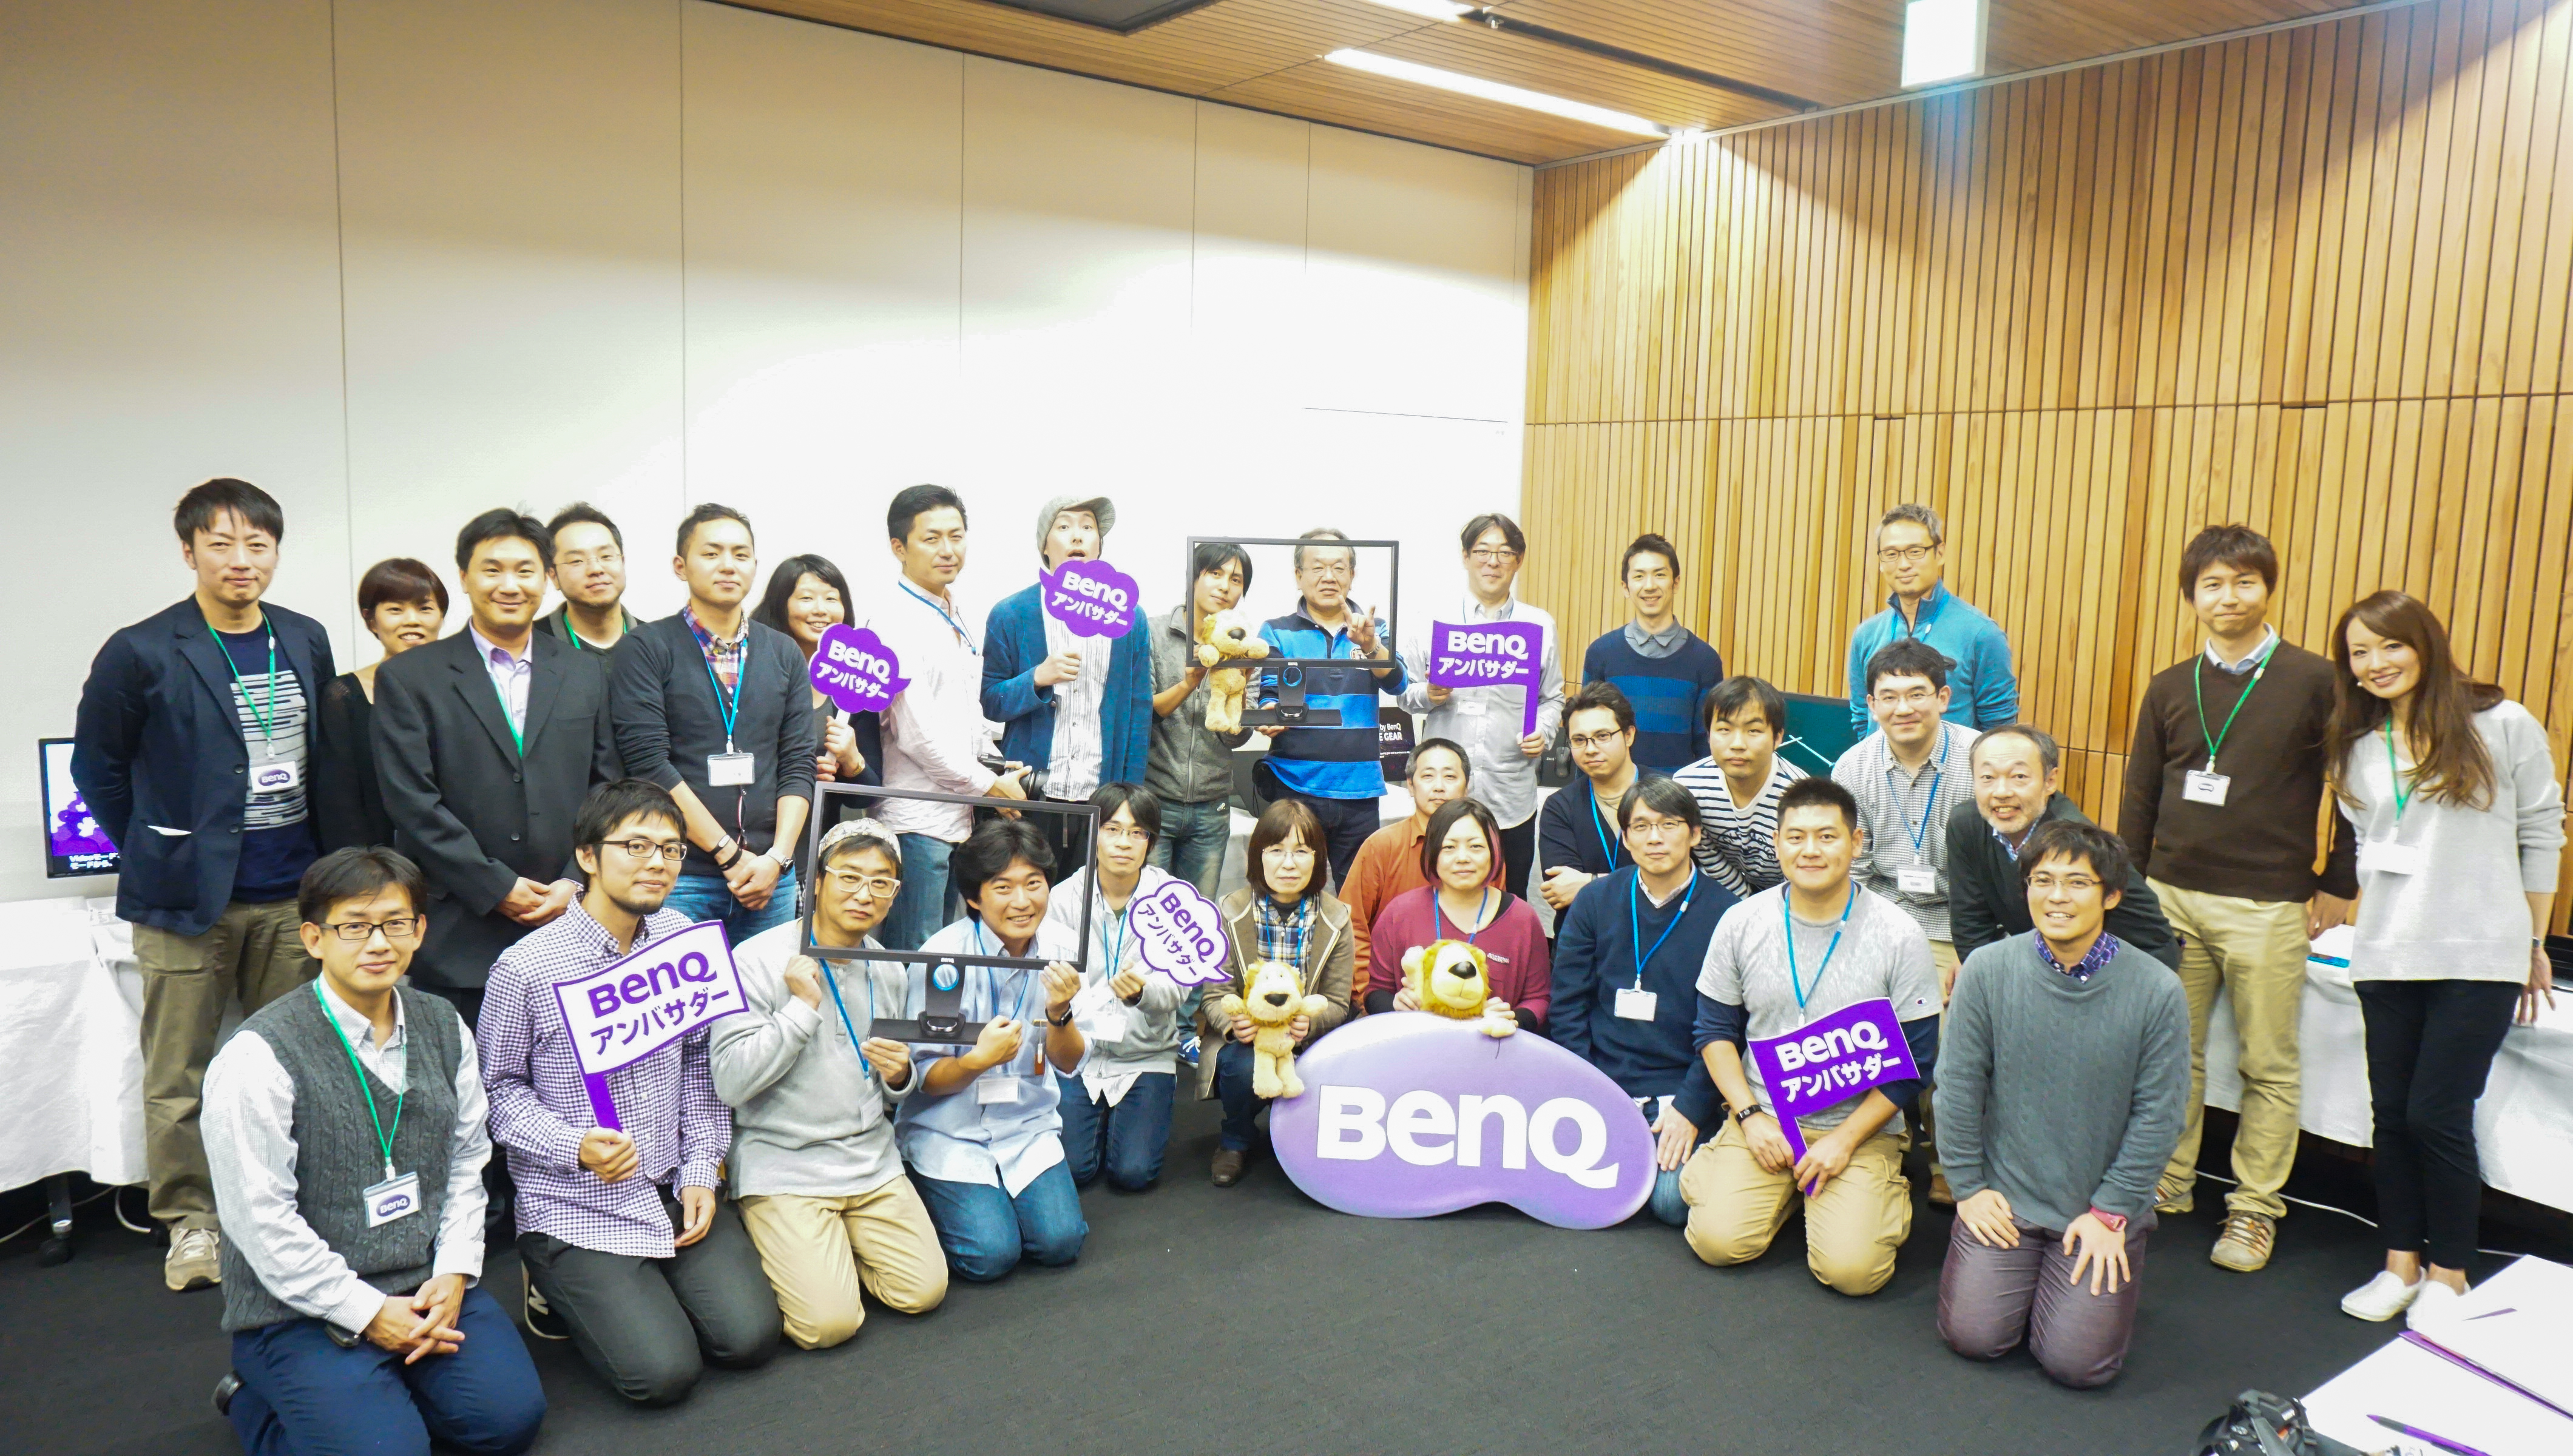 BenQアンバサダー活動報告『第1回BenQアンバサダーイベント』を開催しました。